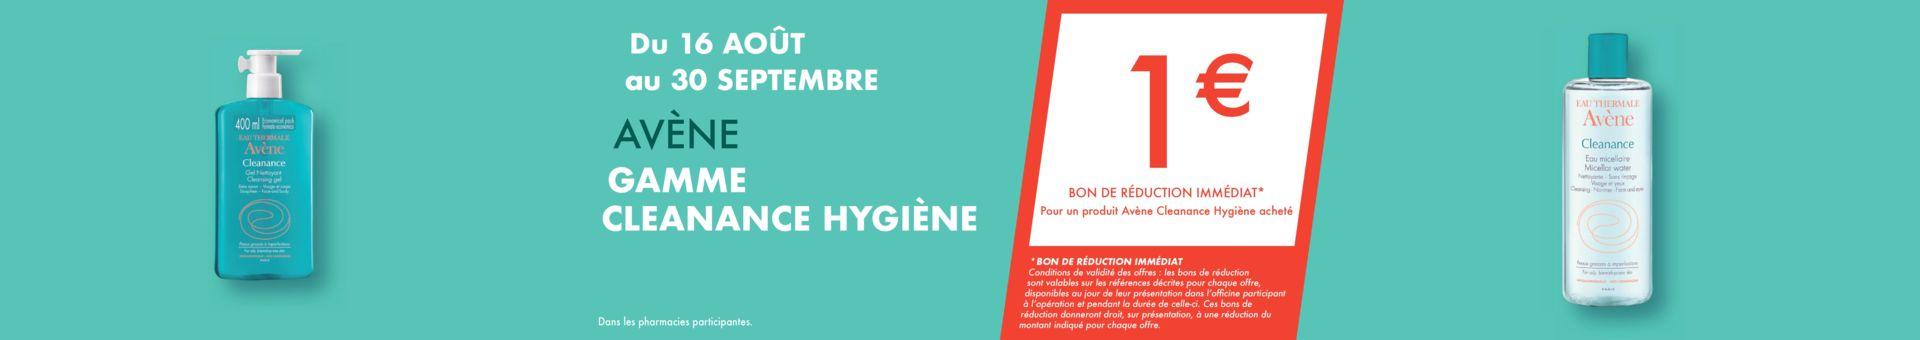 Pharmacie Poincare,Dijon